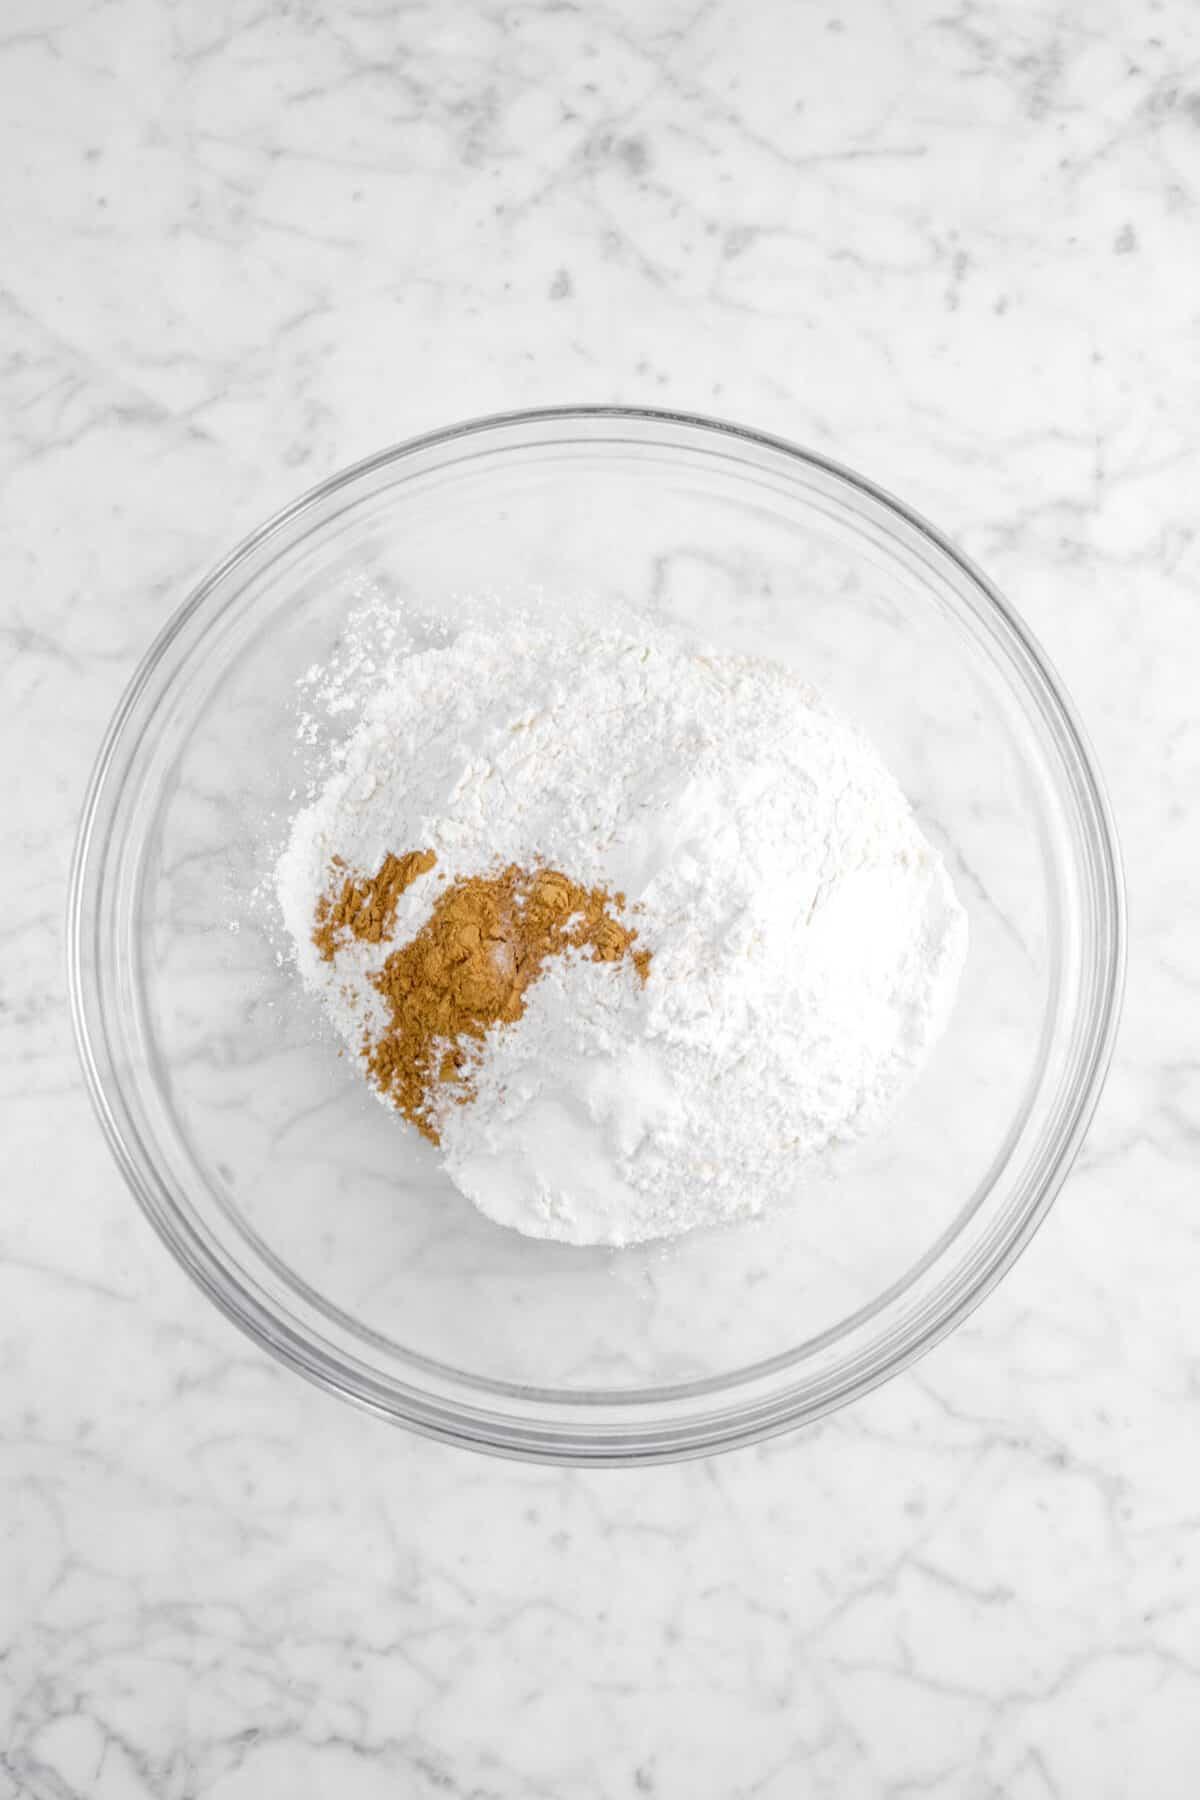 flour, salt, baking powder, baking soda, and cinnamon in a glass bowl